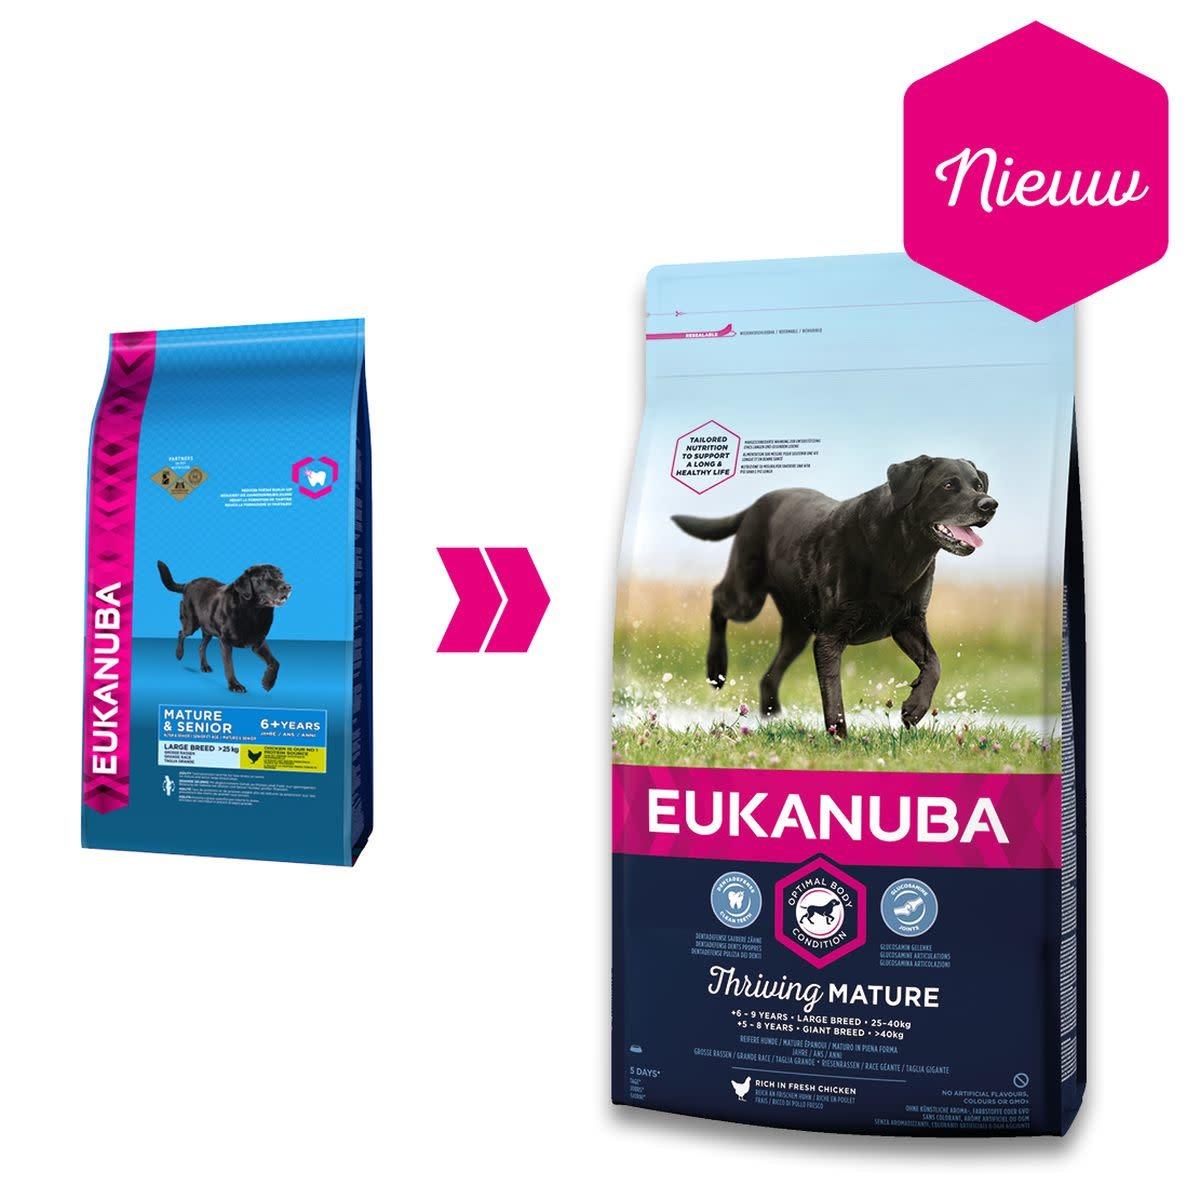 Eukanuba EUKANUBA - MATURE/SENIOR LARGE BREED 12 KG KIP